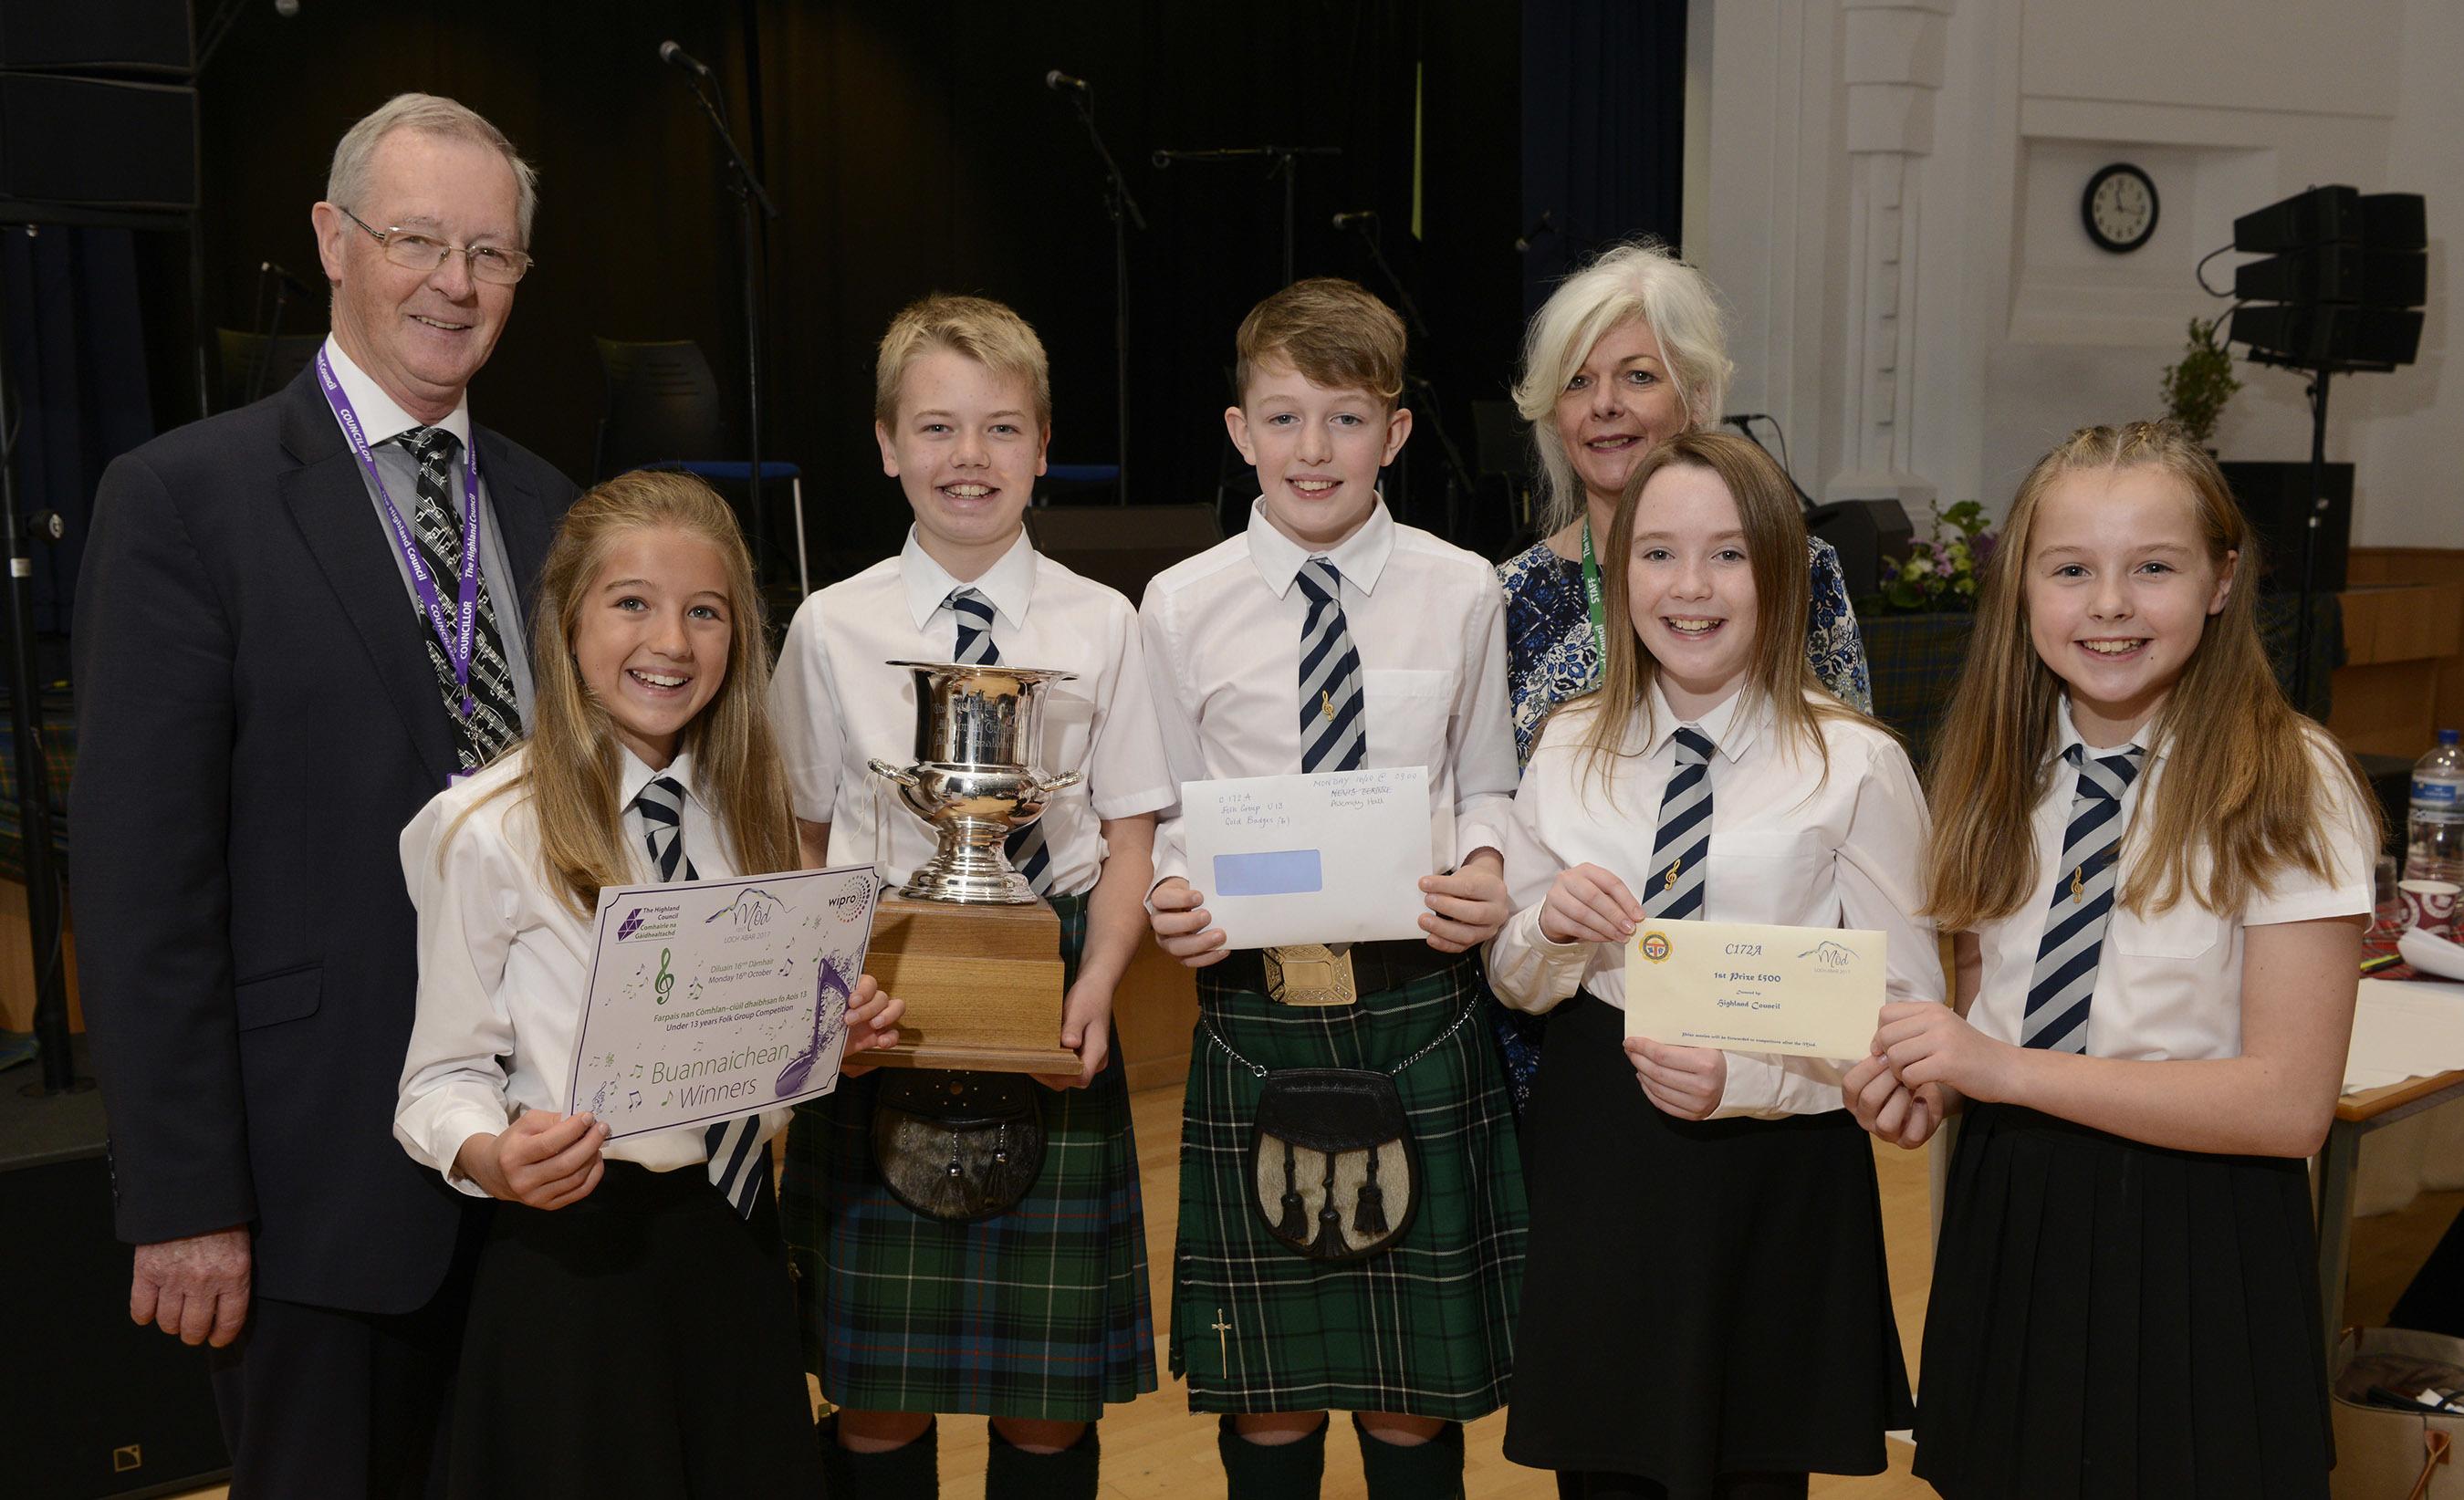 Councillor Allan Hendeson and Morag Anna Macleod of the Highland Council present the award to Dingwall singers (left - right)  Mhairi MacKenzie, Ruaraidh Drennan, Finlay MacLennan, Andrea MacDonald and Isabelle Rose.